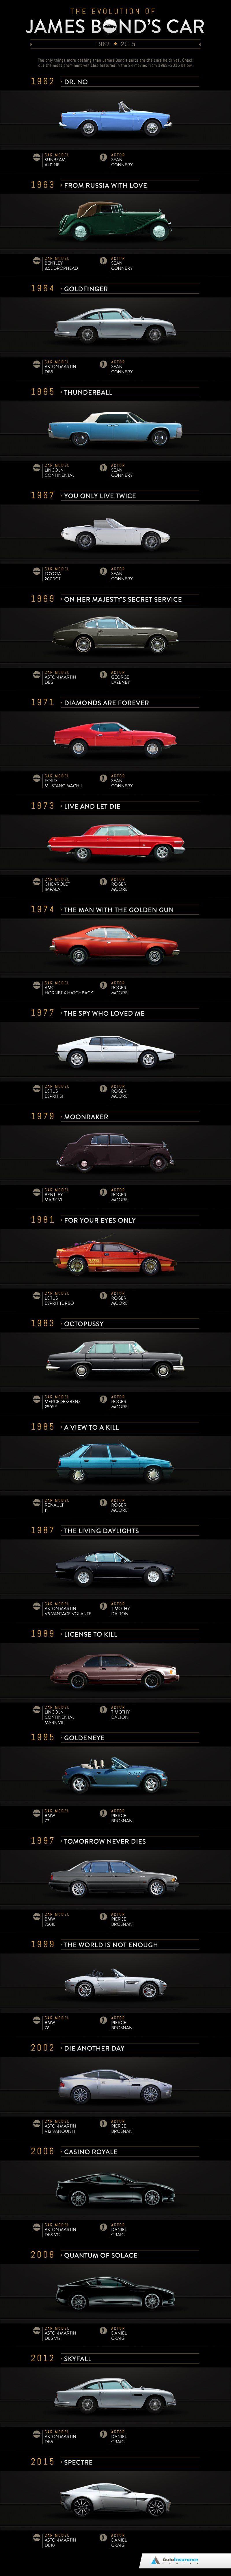 James-Bond-Car-Evolution